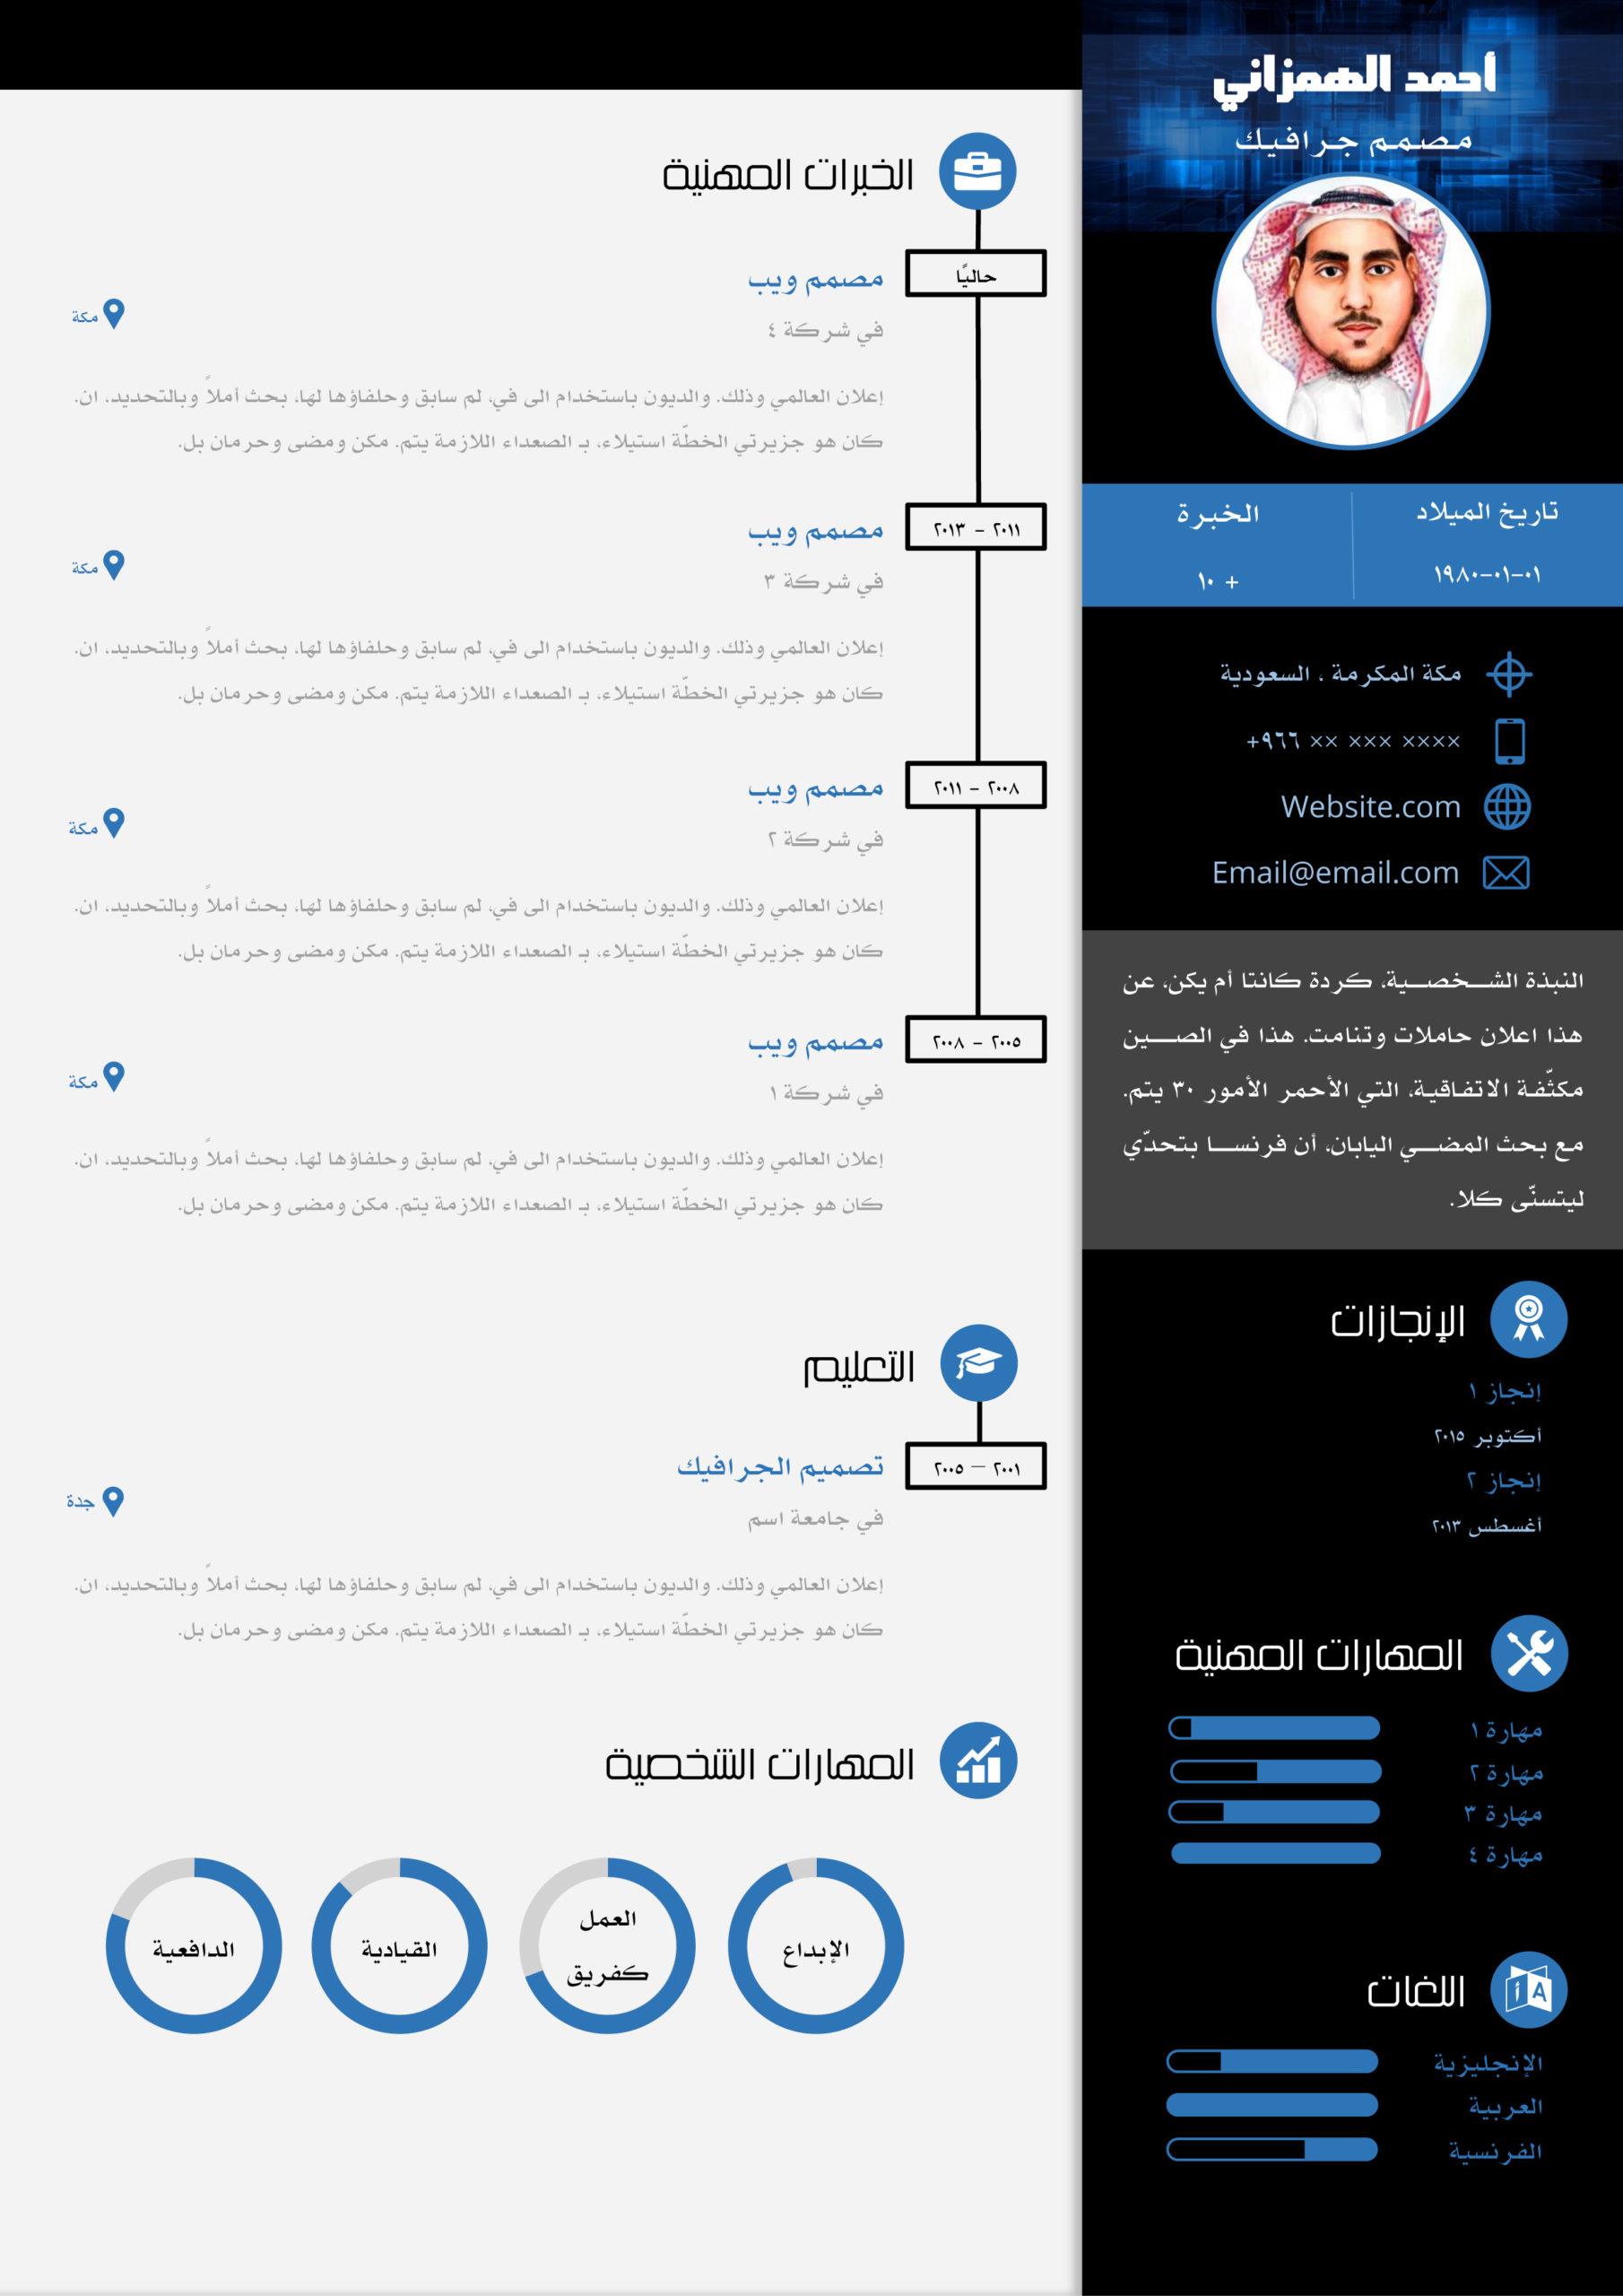 free arabic resume template for job seeker pivle. Black Bedroom Furniture Sets. Home Design Ideas